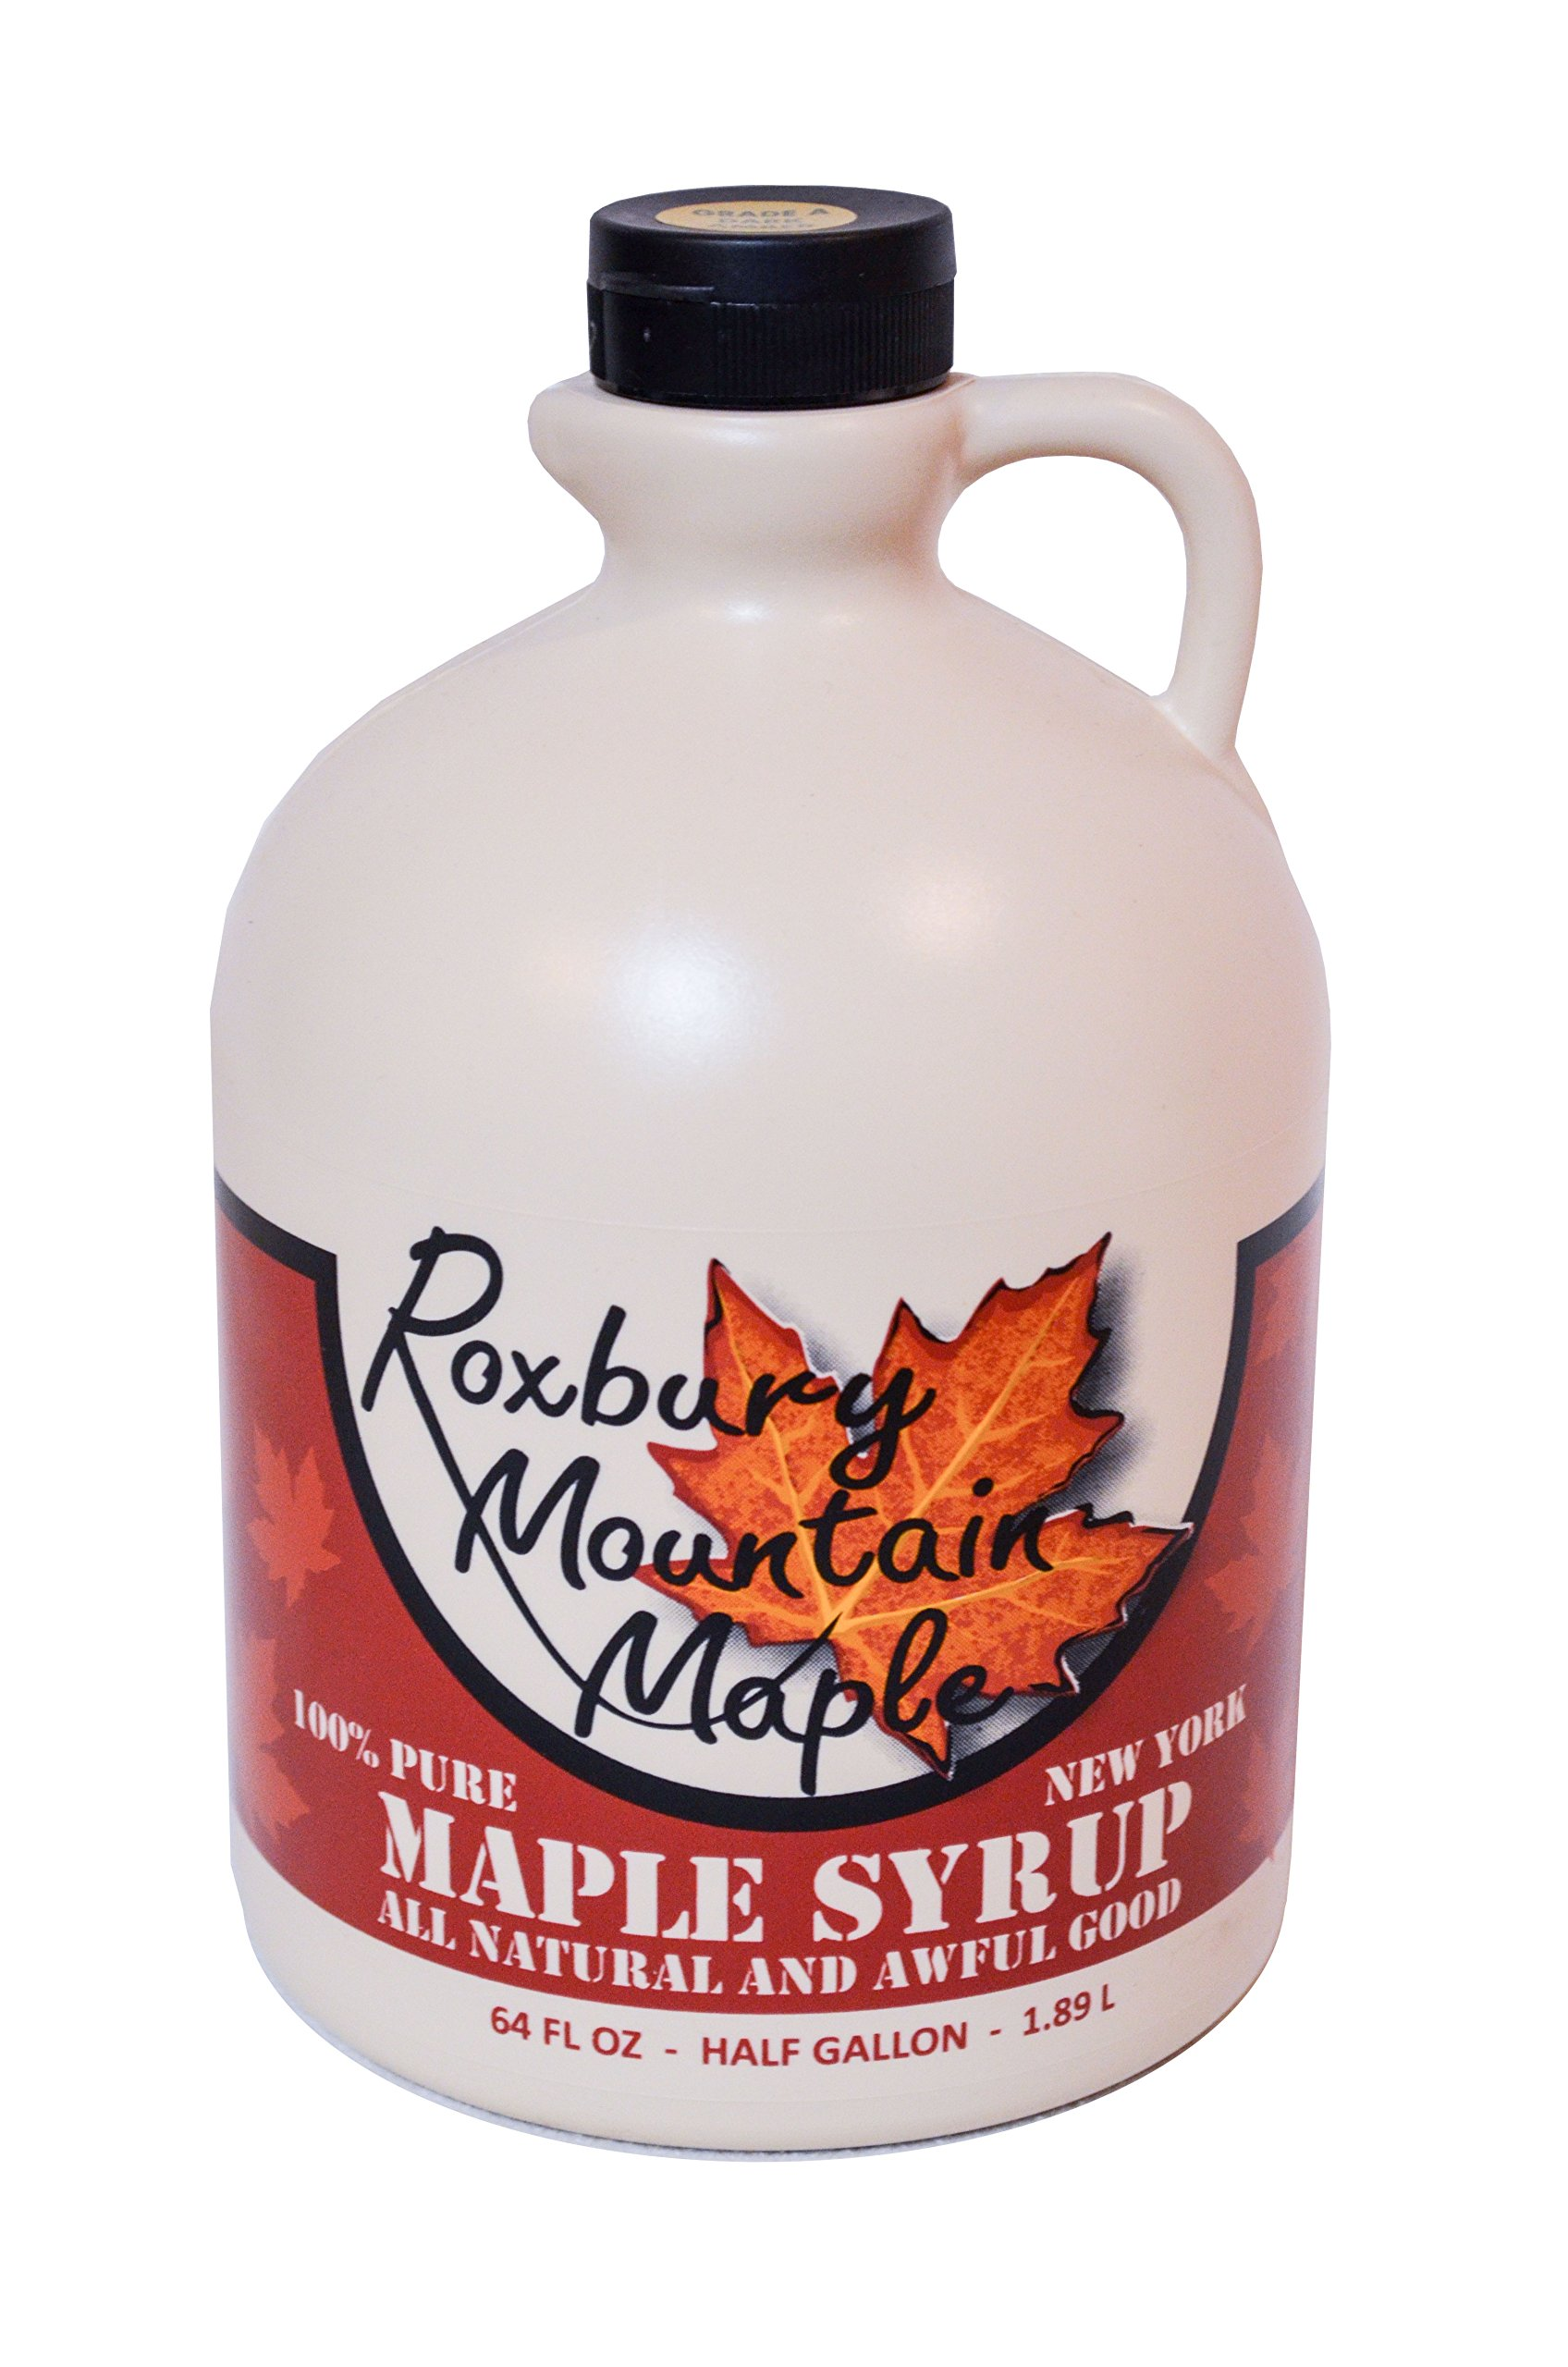 Half Gallon of Organic Grade A Dark Maple Syrup, Roxbury Mountain Maple 64 OZ